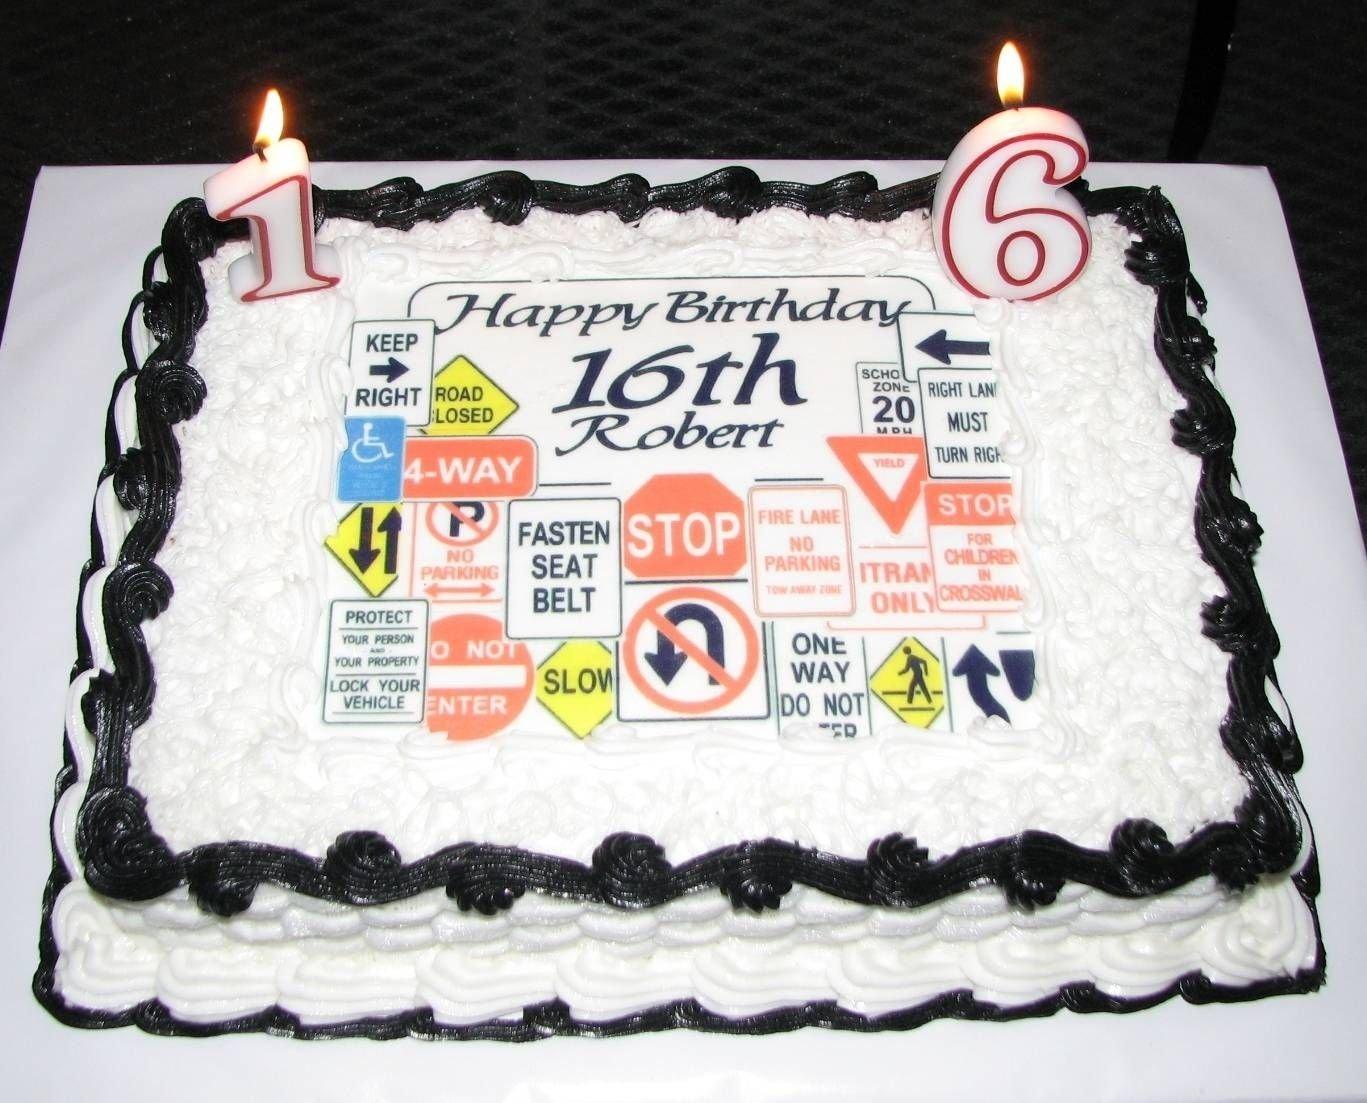 10 Ideal 16Th Birthday Cake Ideas For Boys 16th birthday cake ideas for boys my next projects pinterest 2